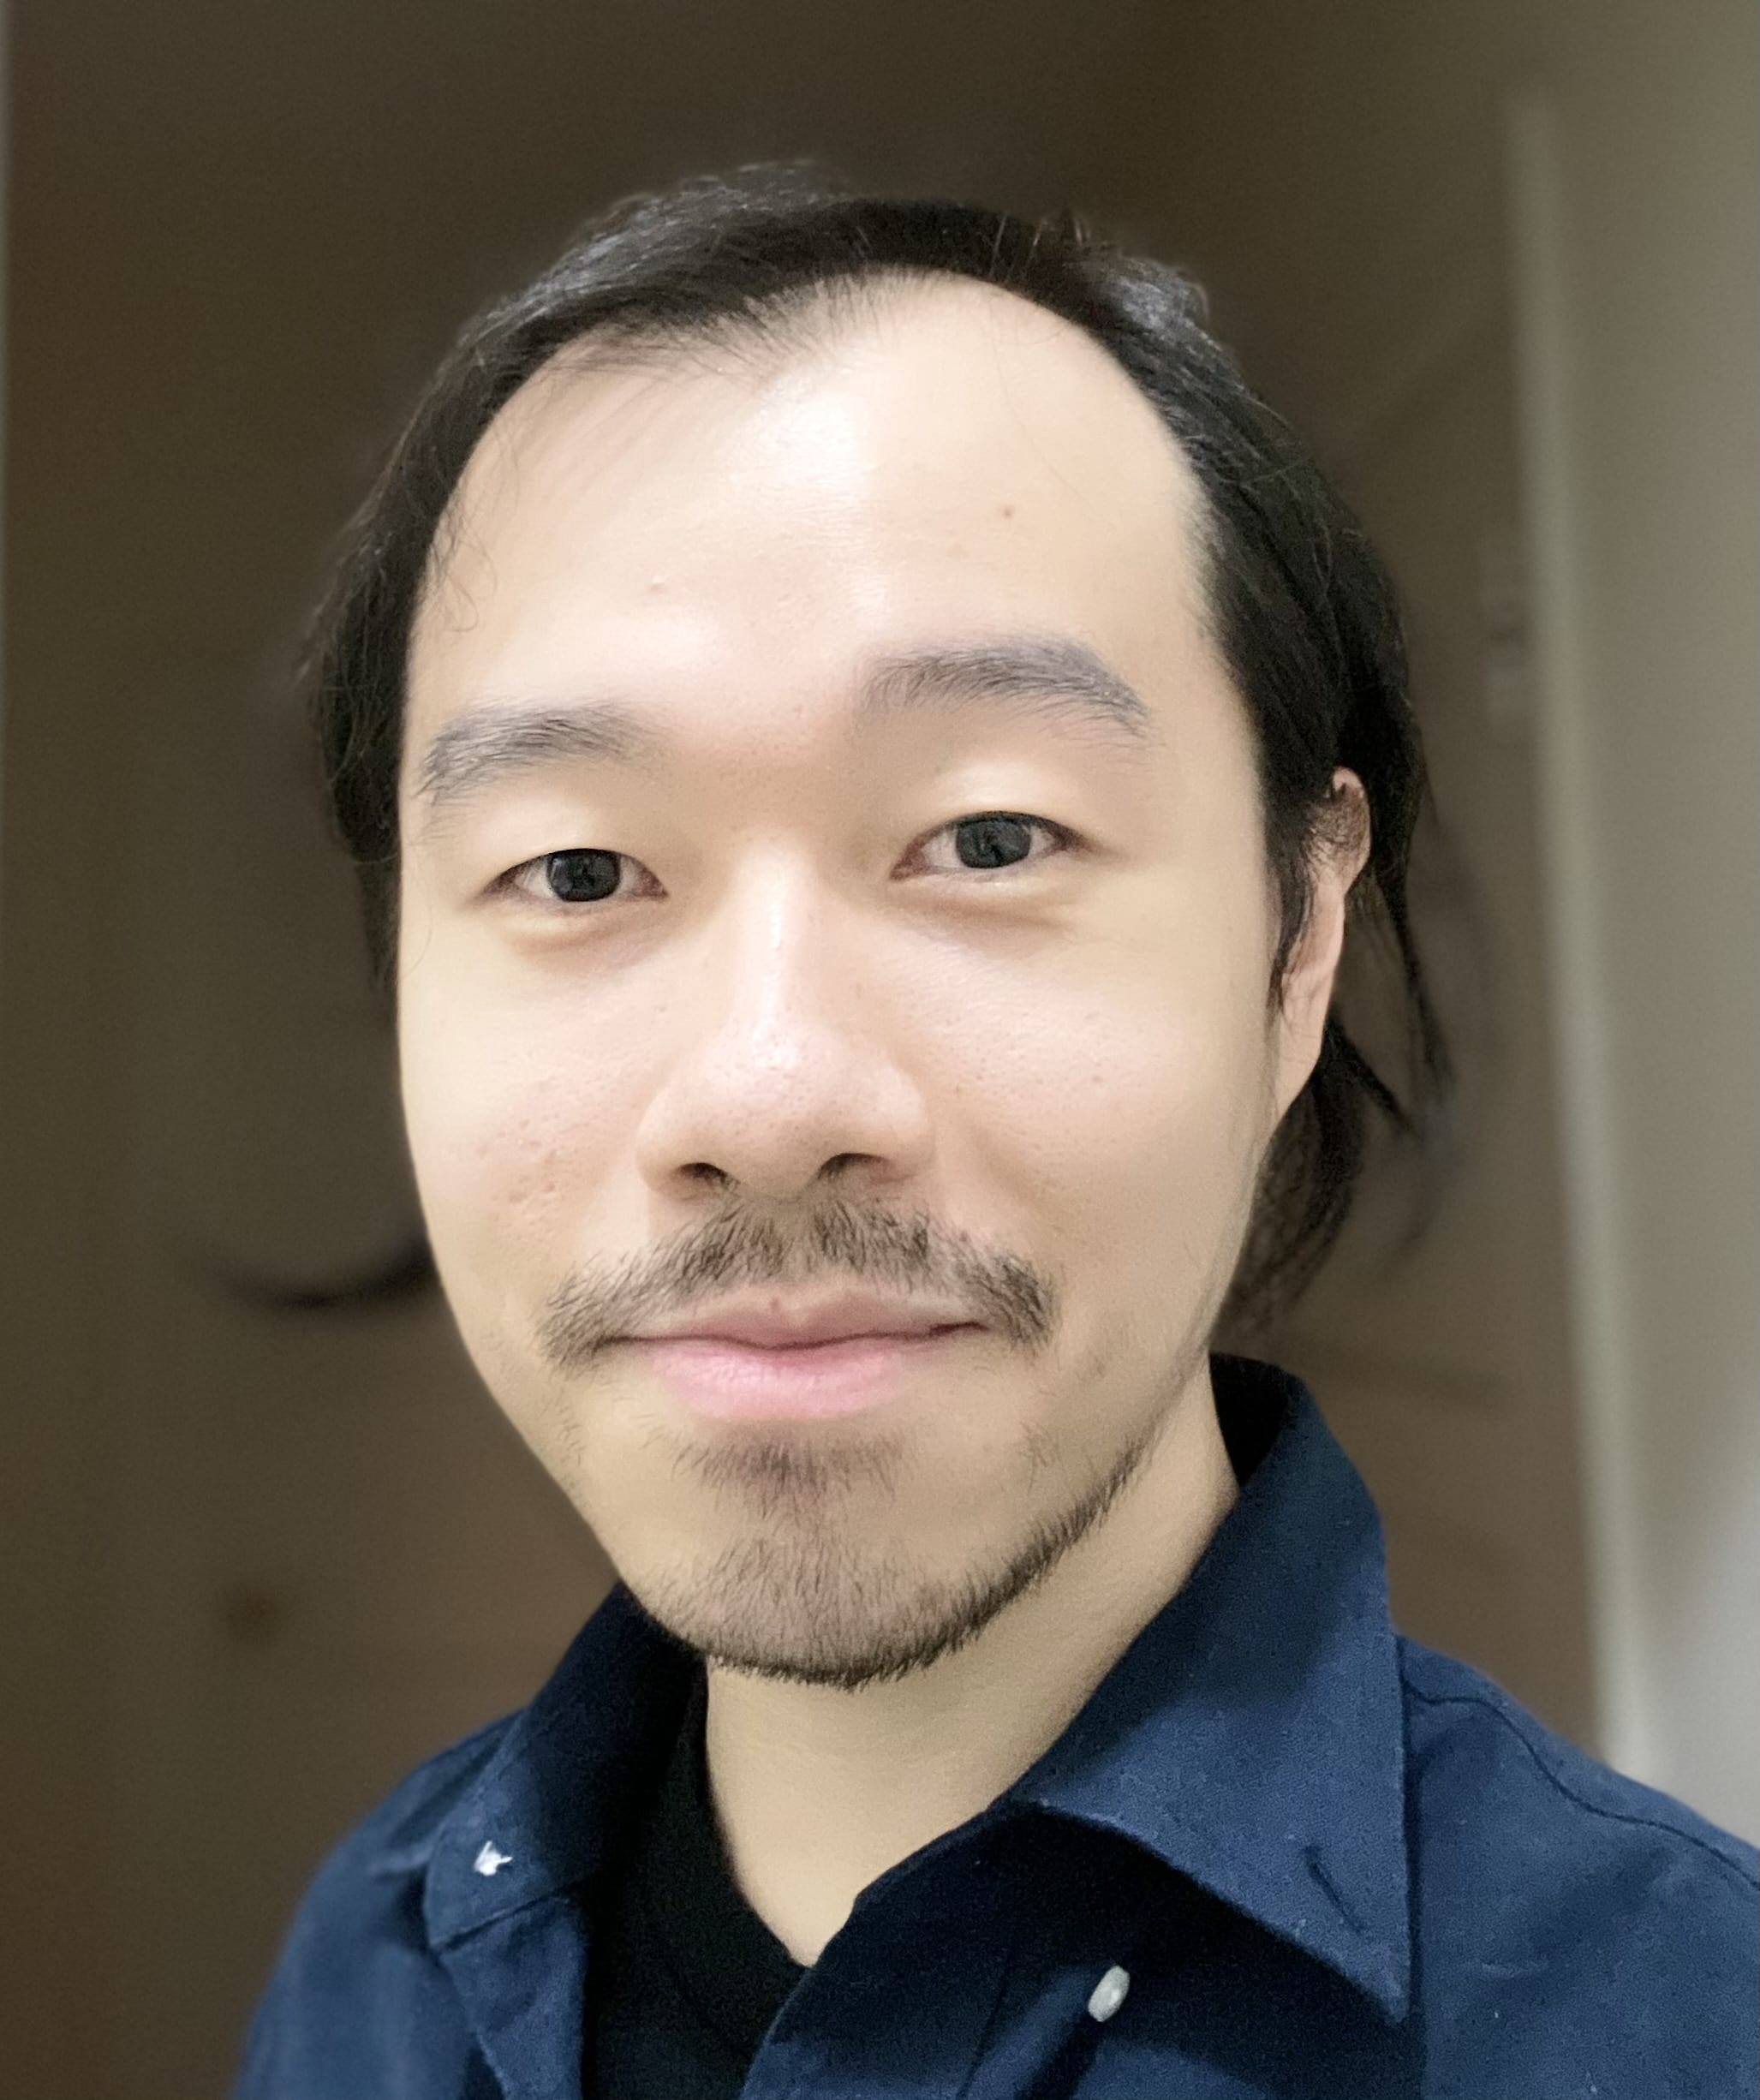 Erwin Tanin Receives International Student Prize Fellowship